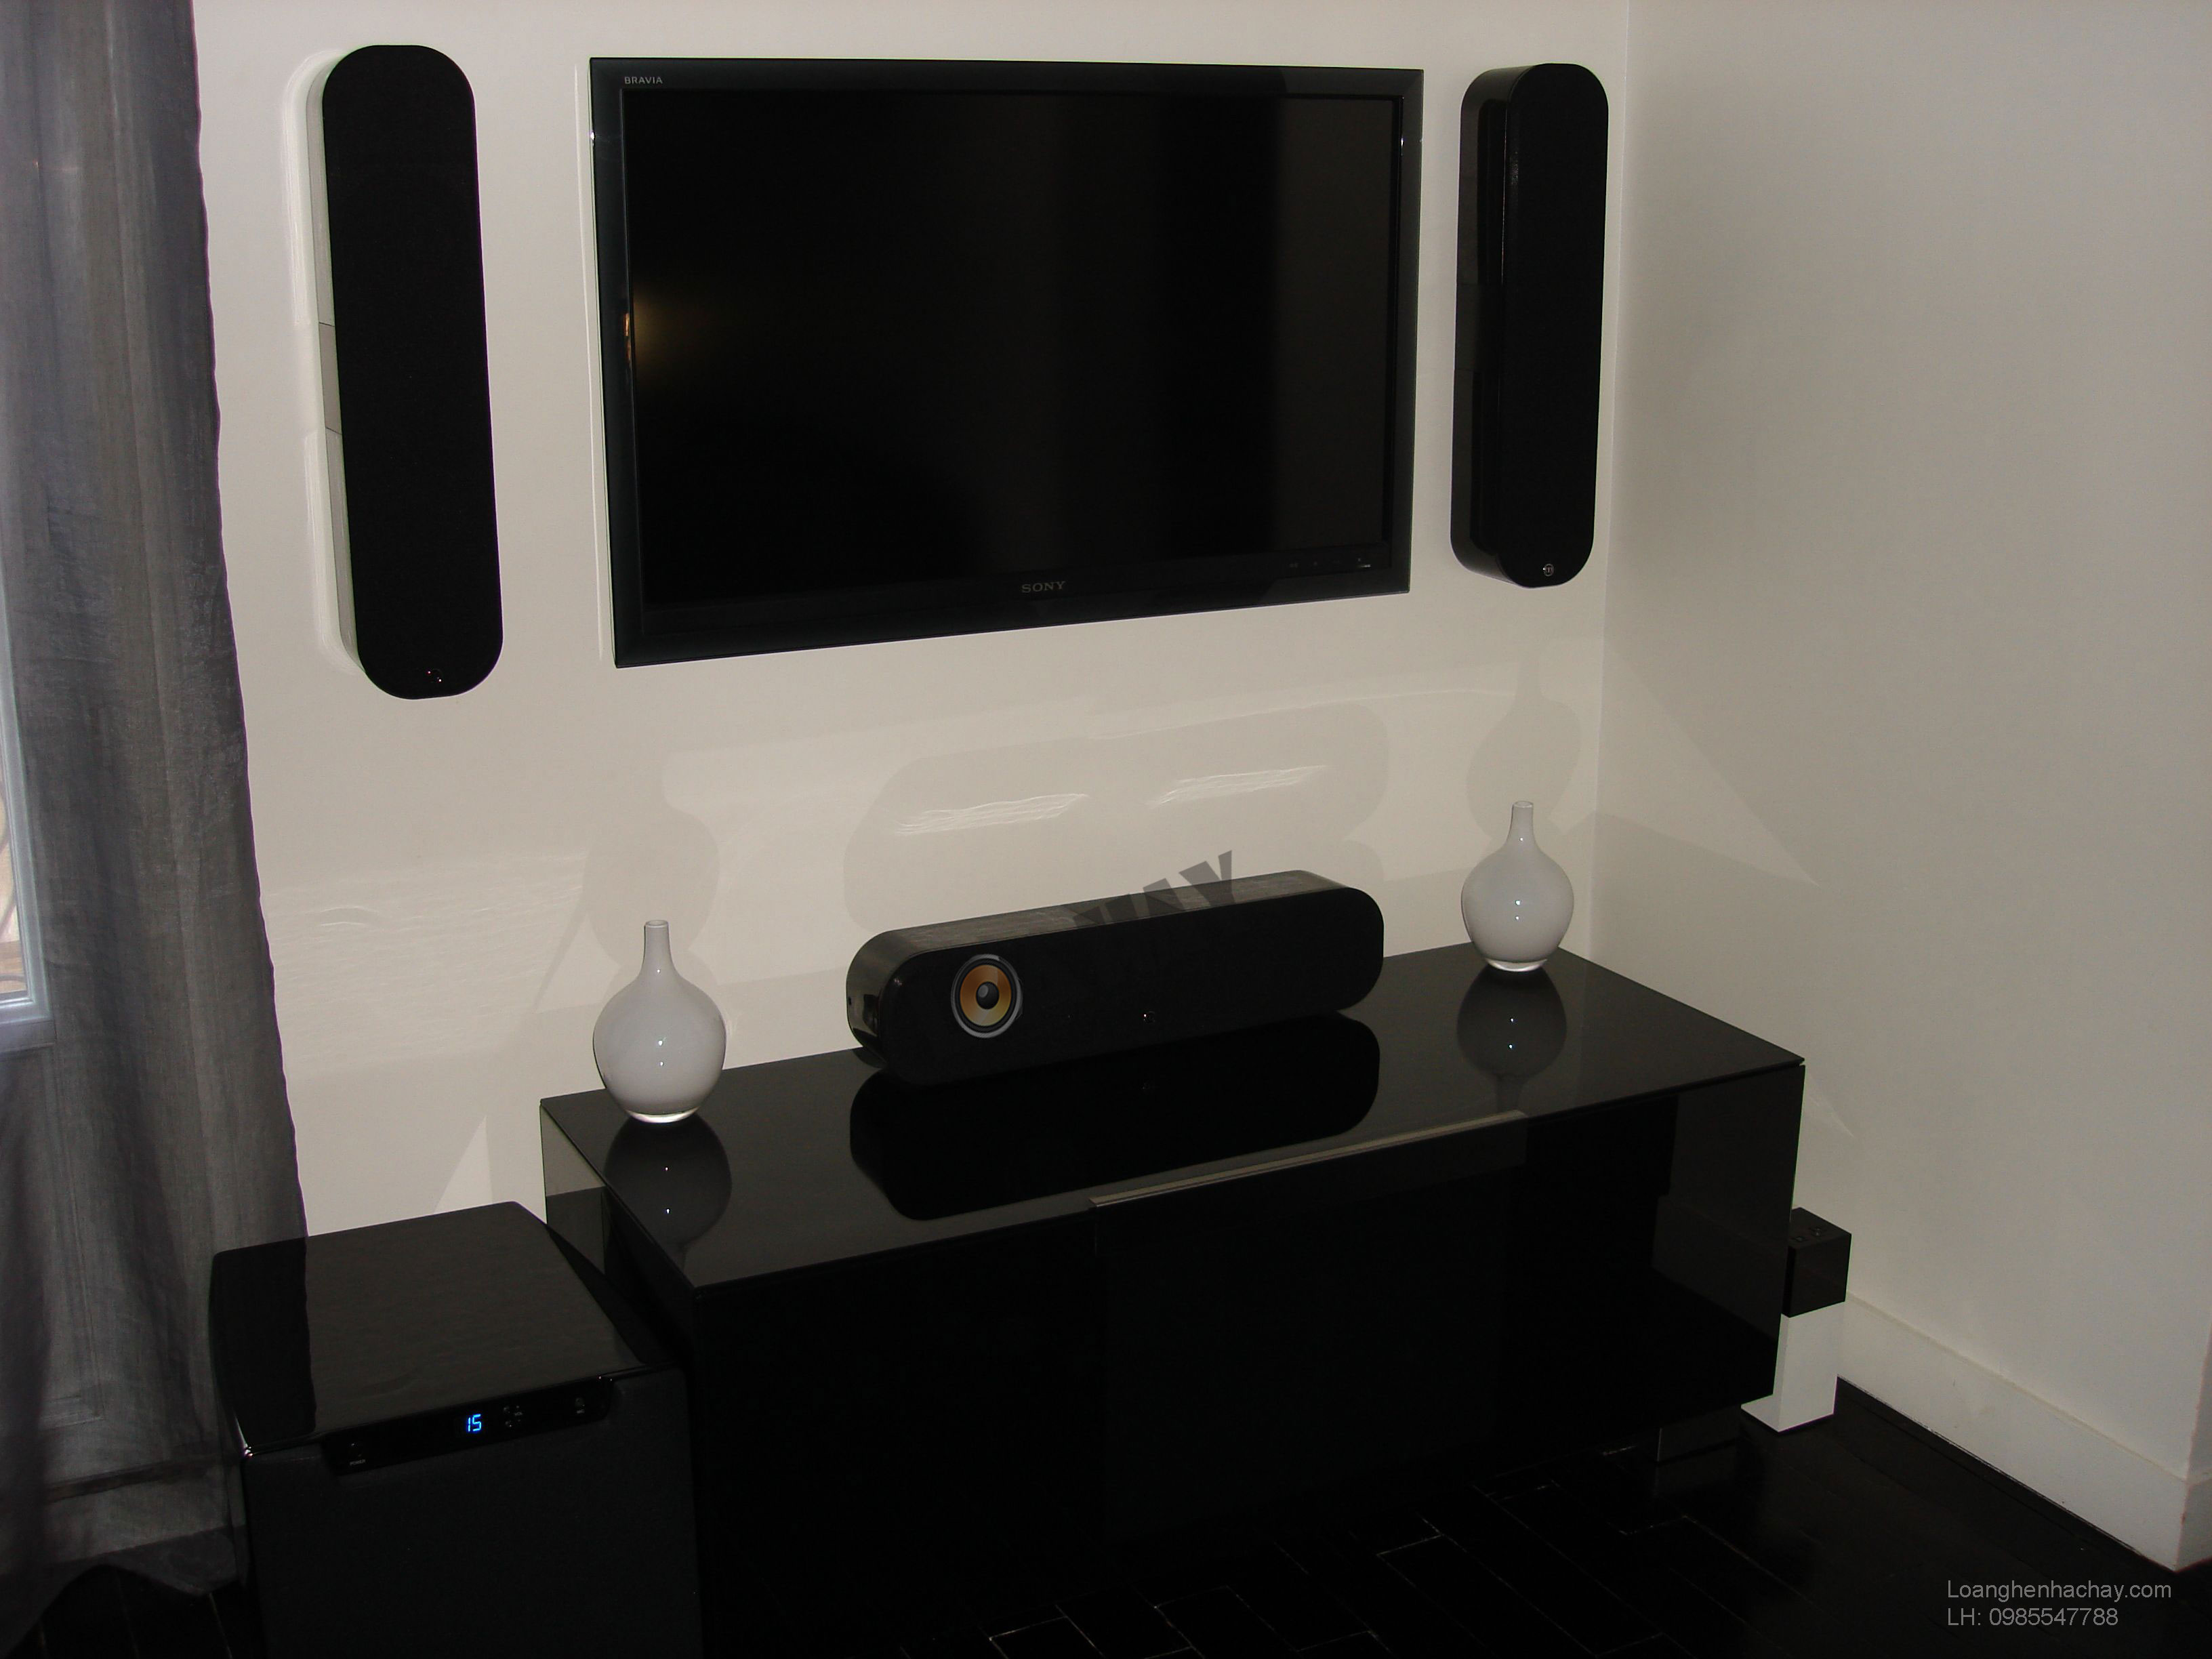 loa monitor audio apex a40 chat